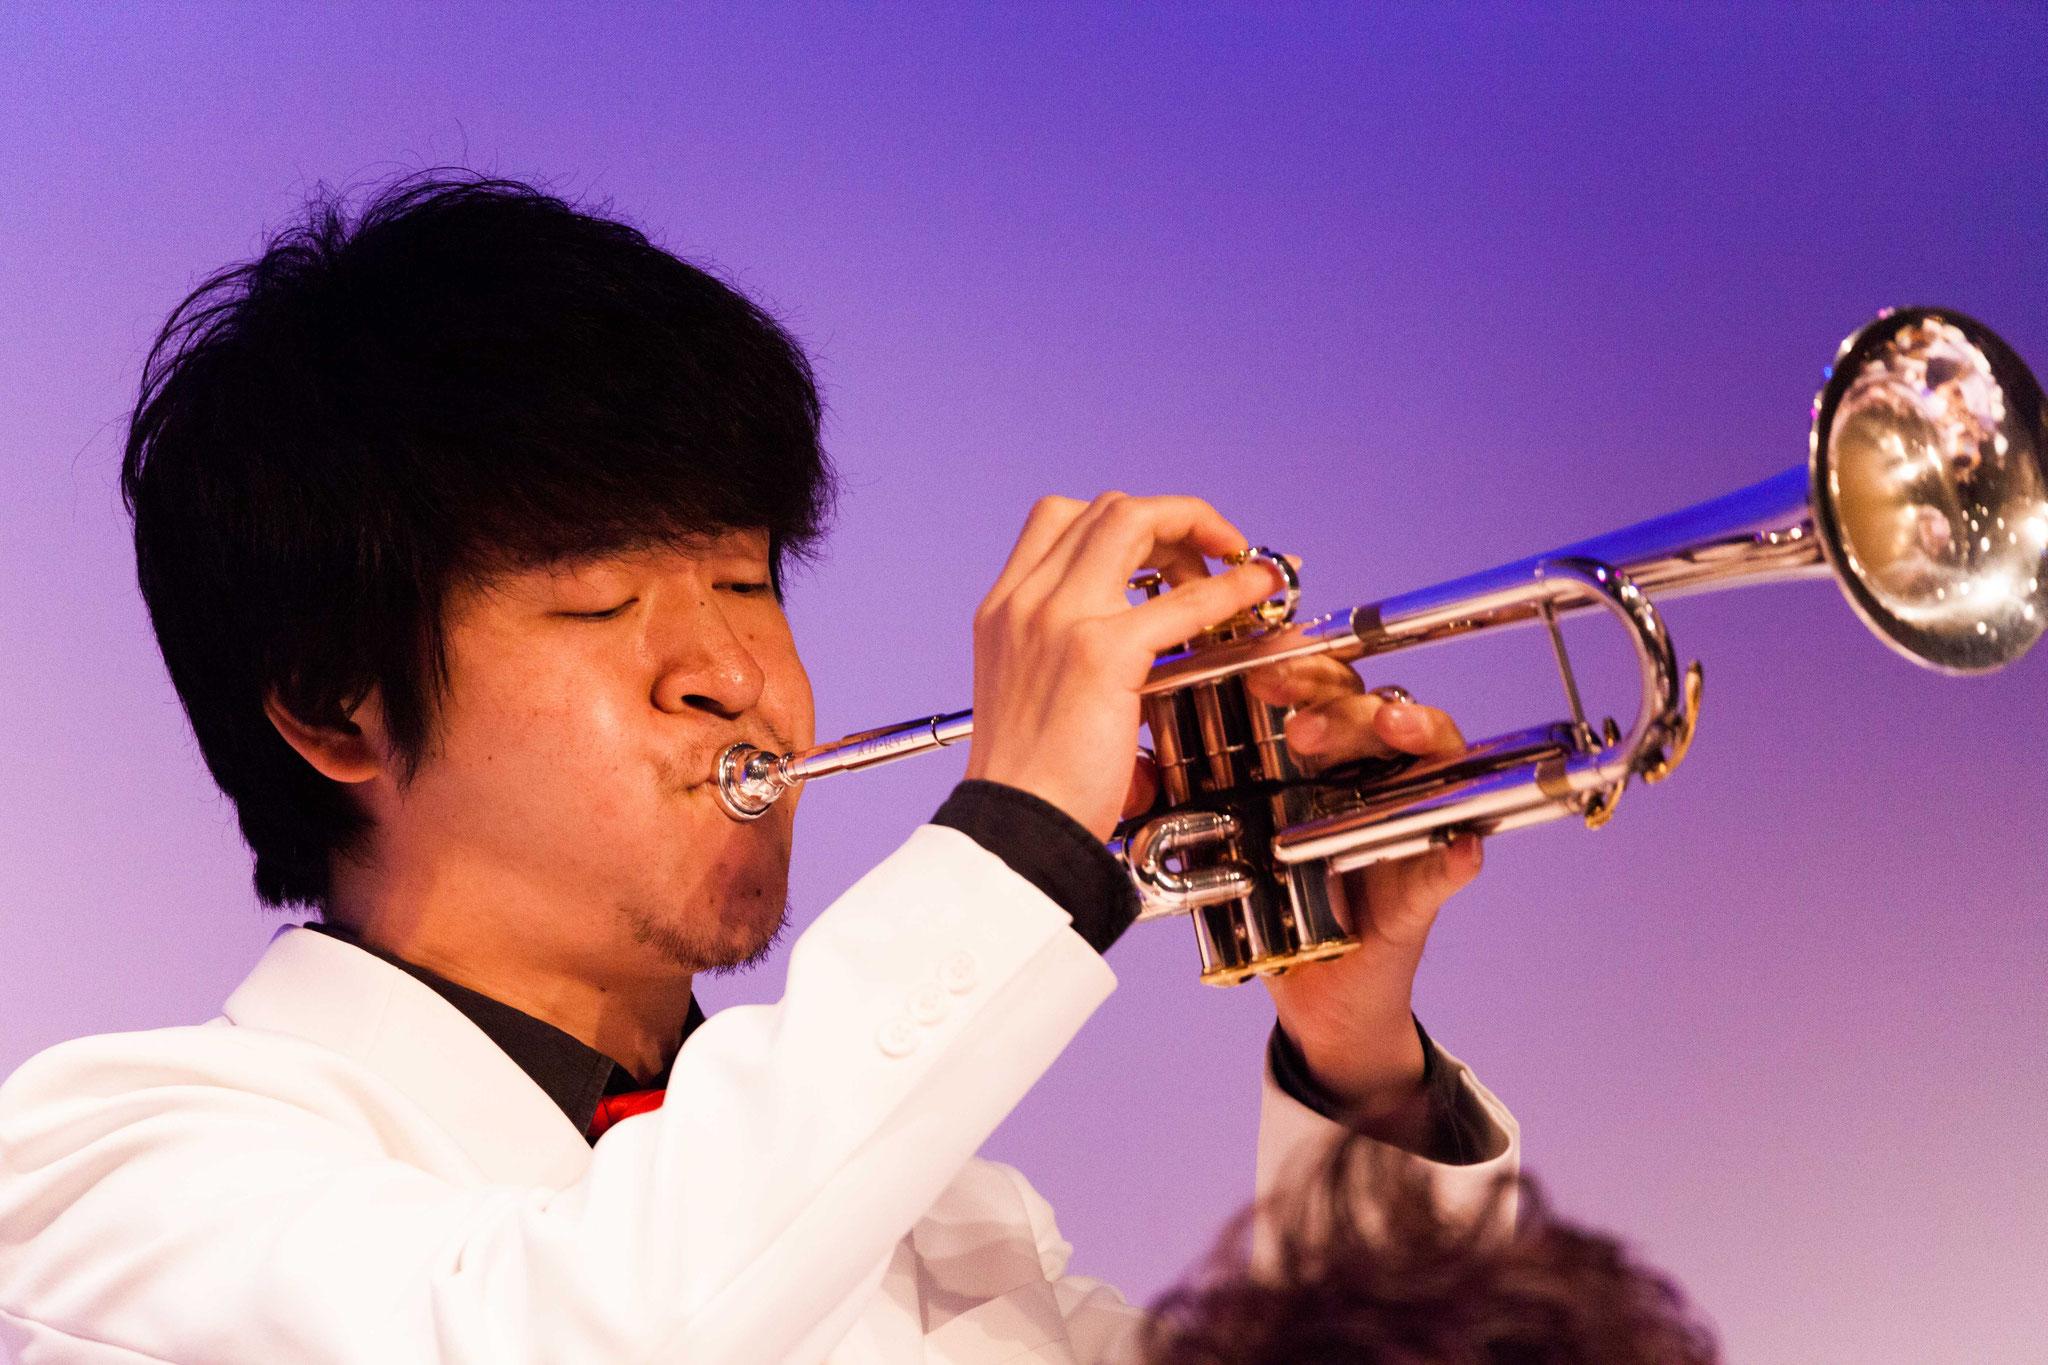 中出貴敏(trumpet)